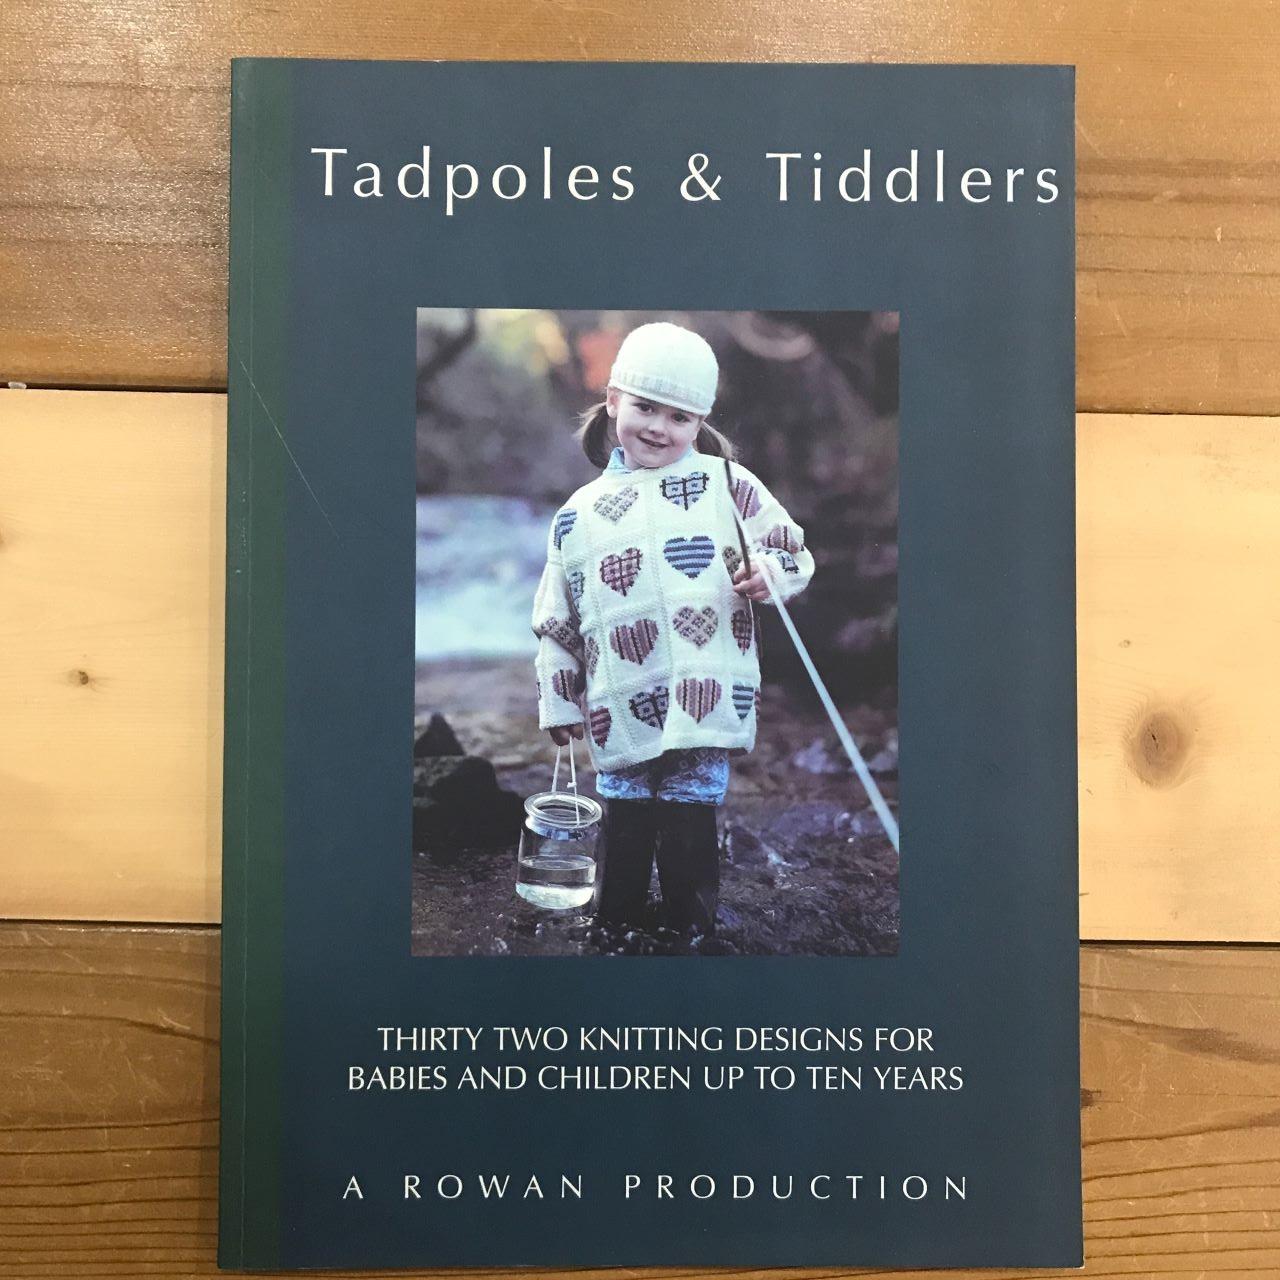 Tadpoles & Tiddlers: 32 Knitting Designs